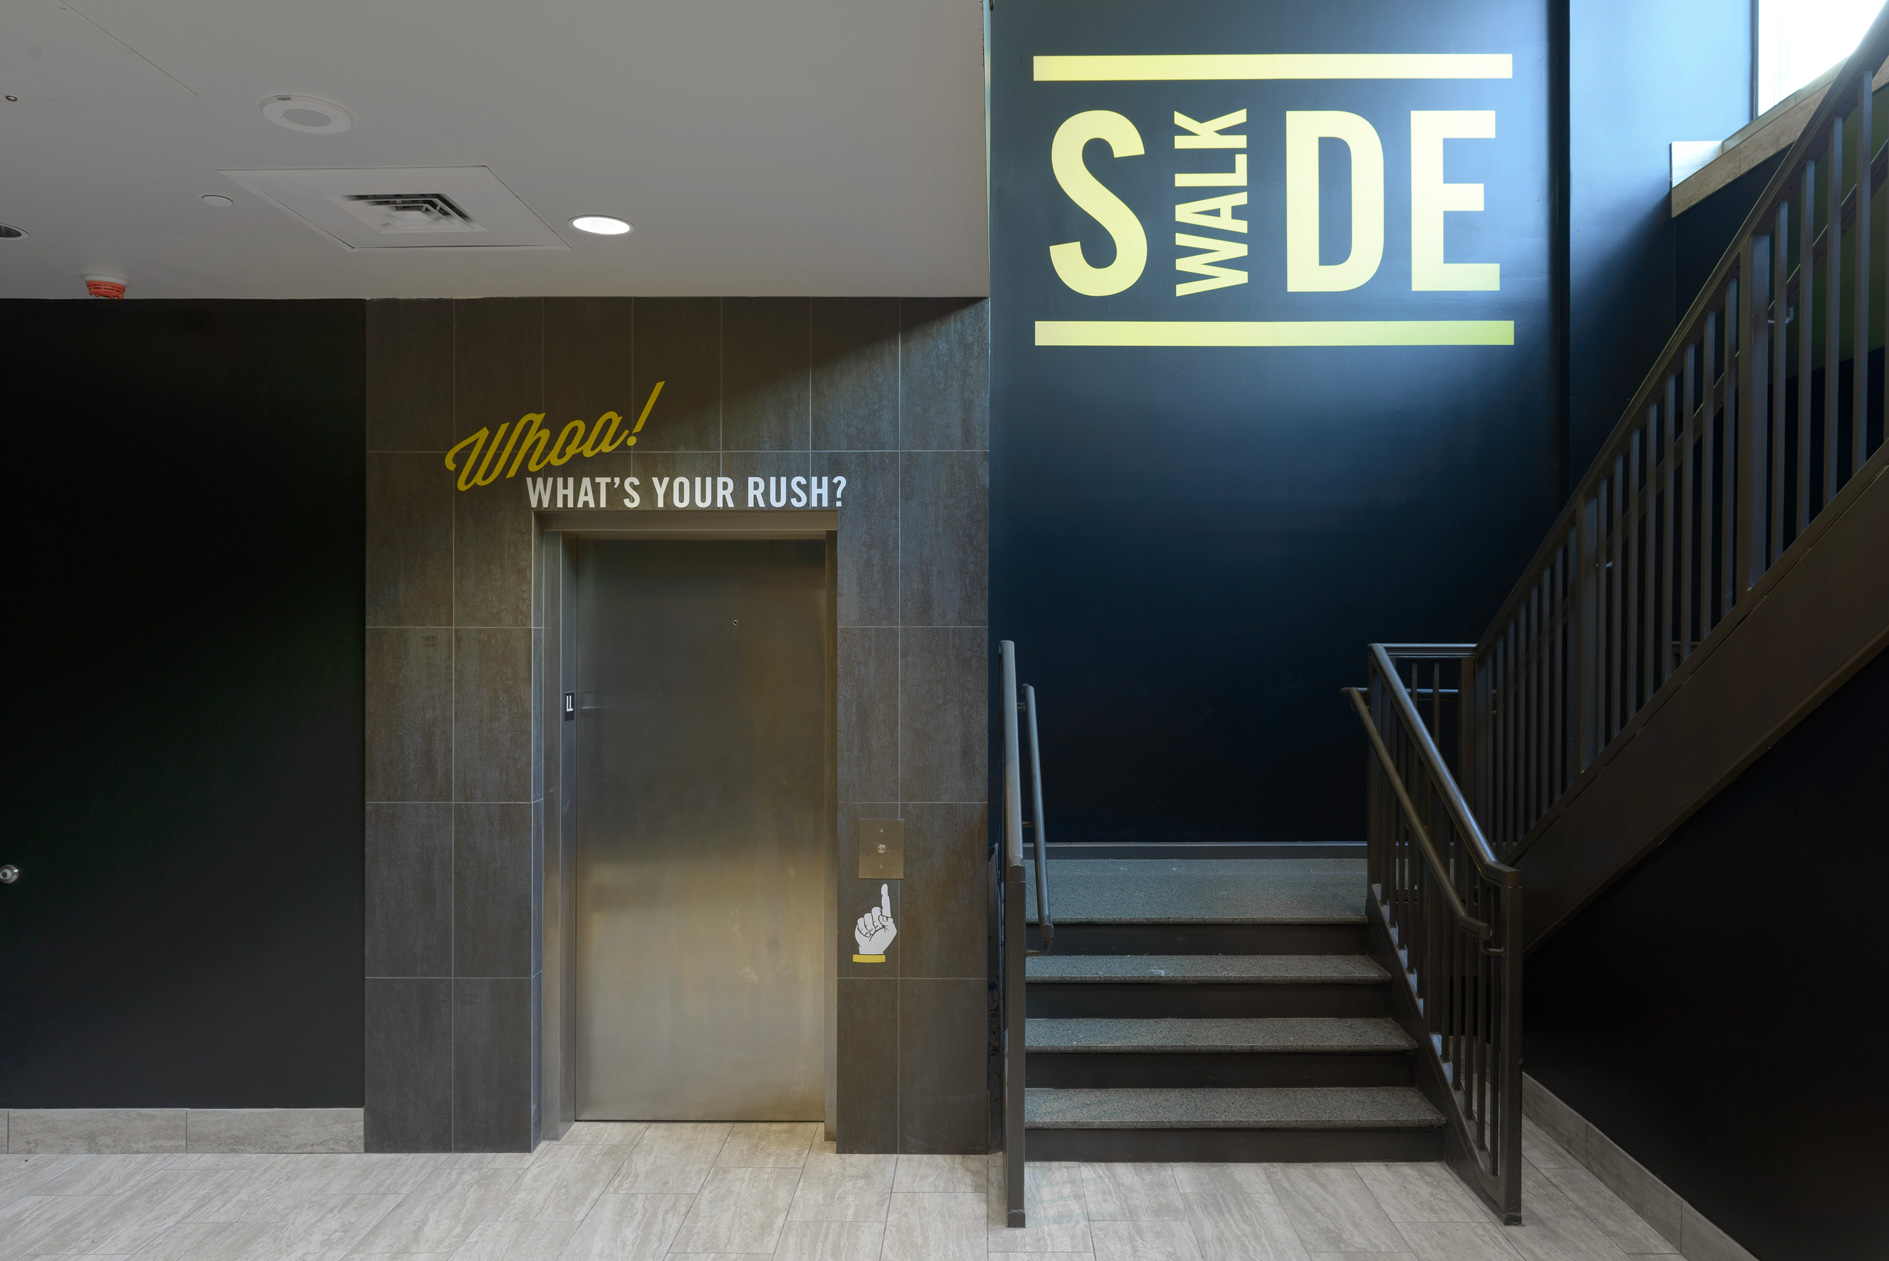 Sidewalk Cinema entry and elevator lobby graphics